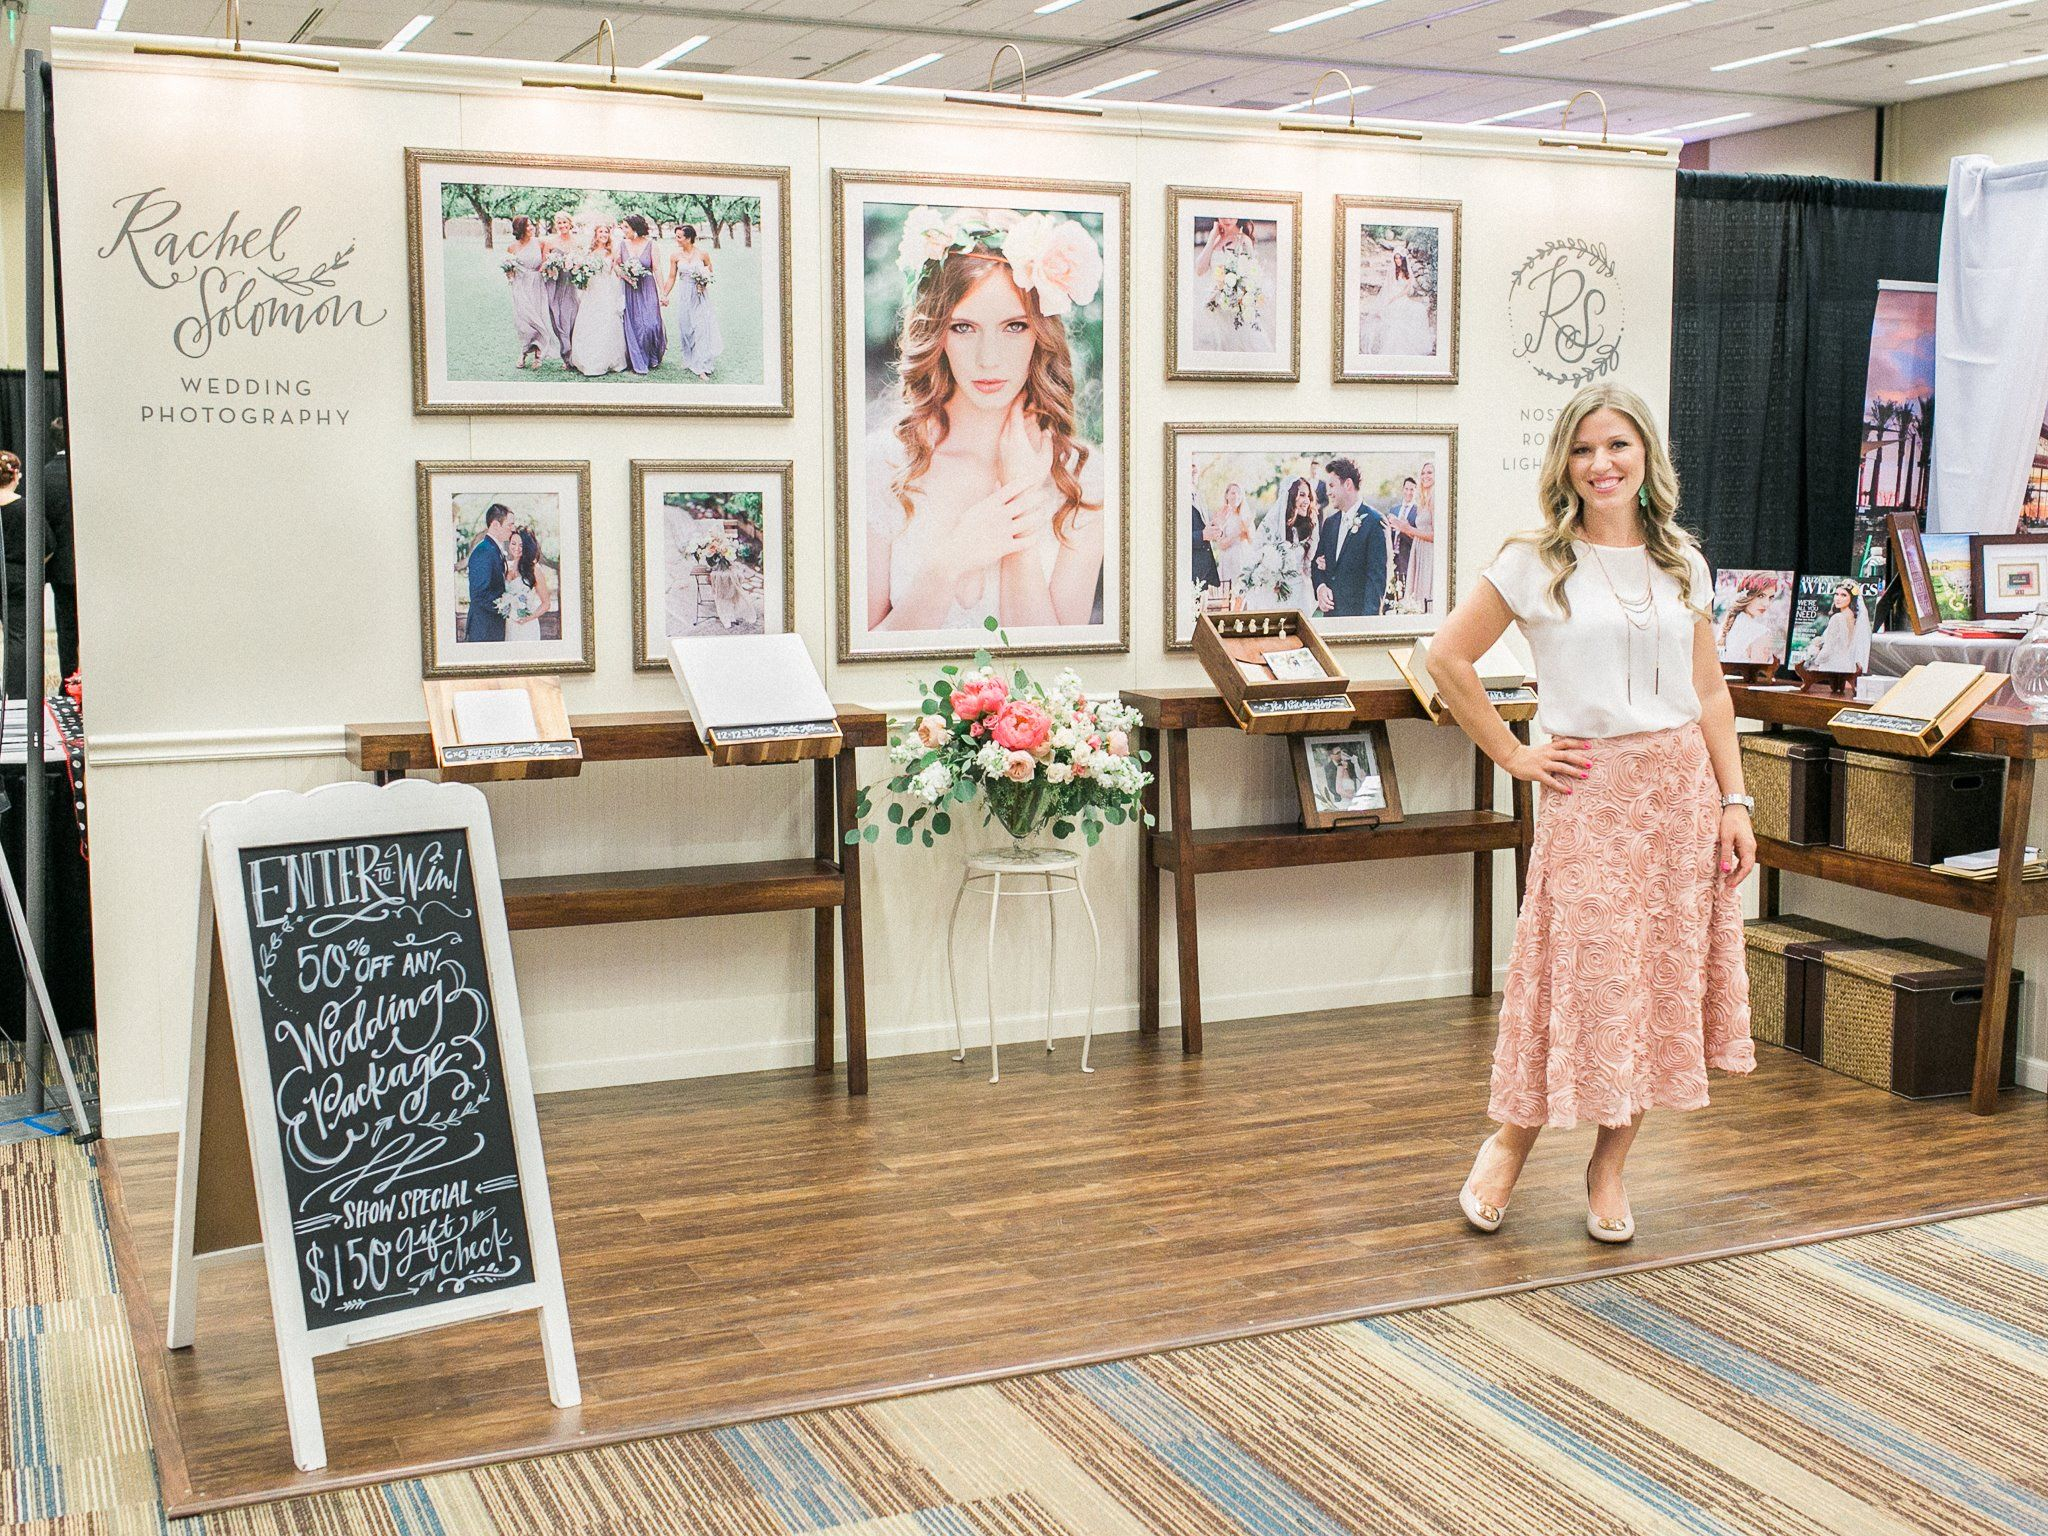 11312901 10206051516154388 5058380587408181199 O Jpg 2048 1536 Wedding Show Booth Photographer Booth Display Photography Booth